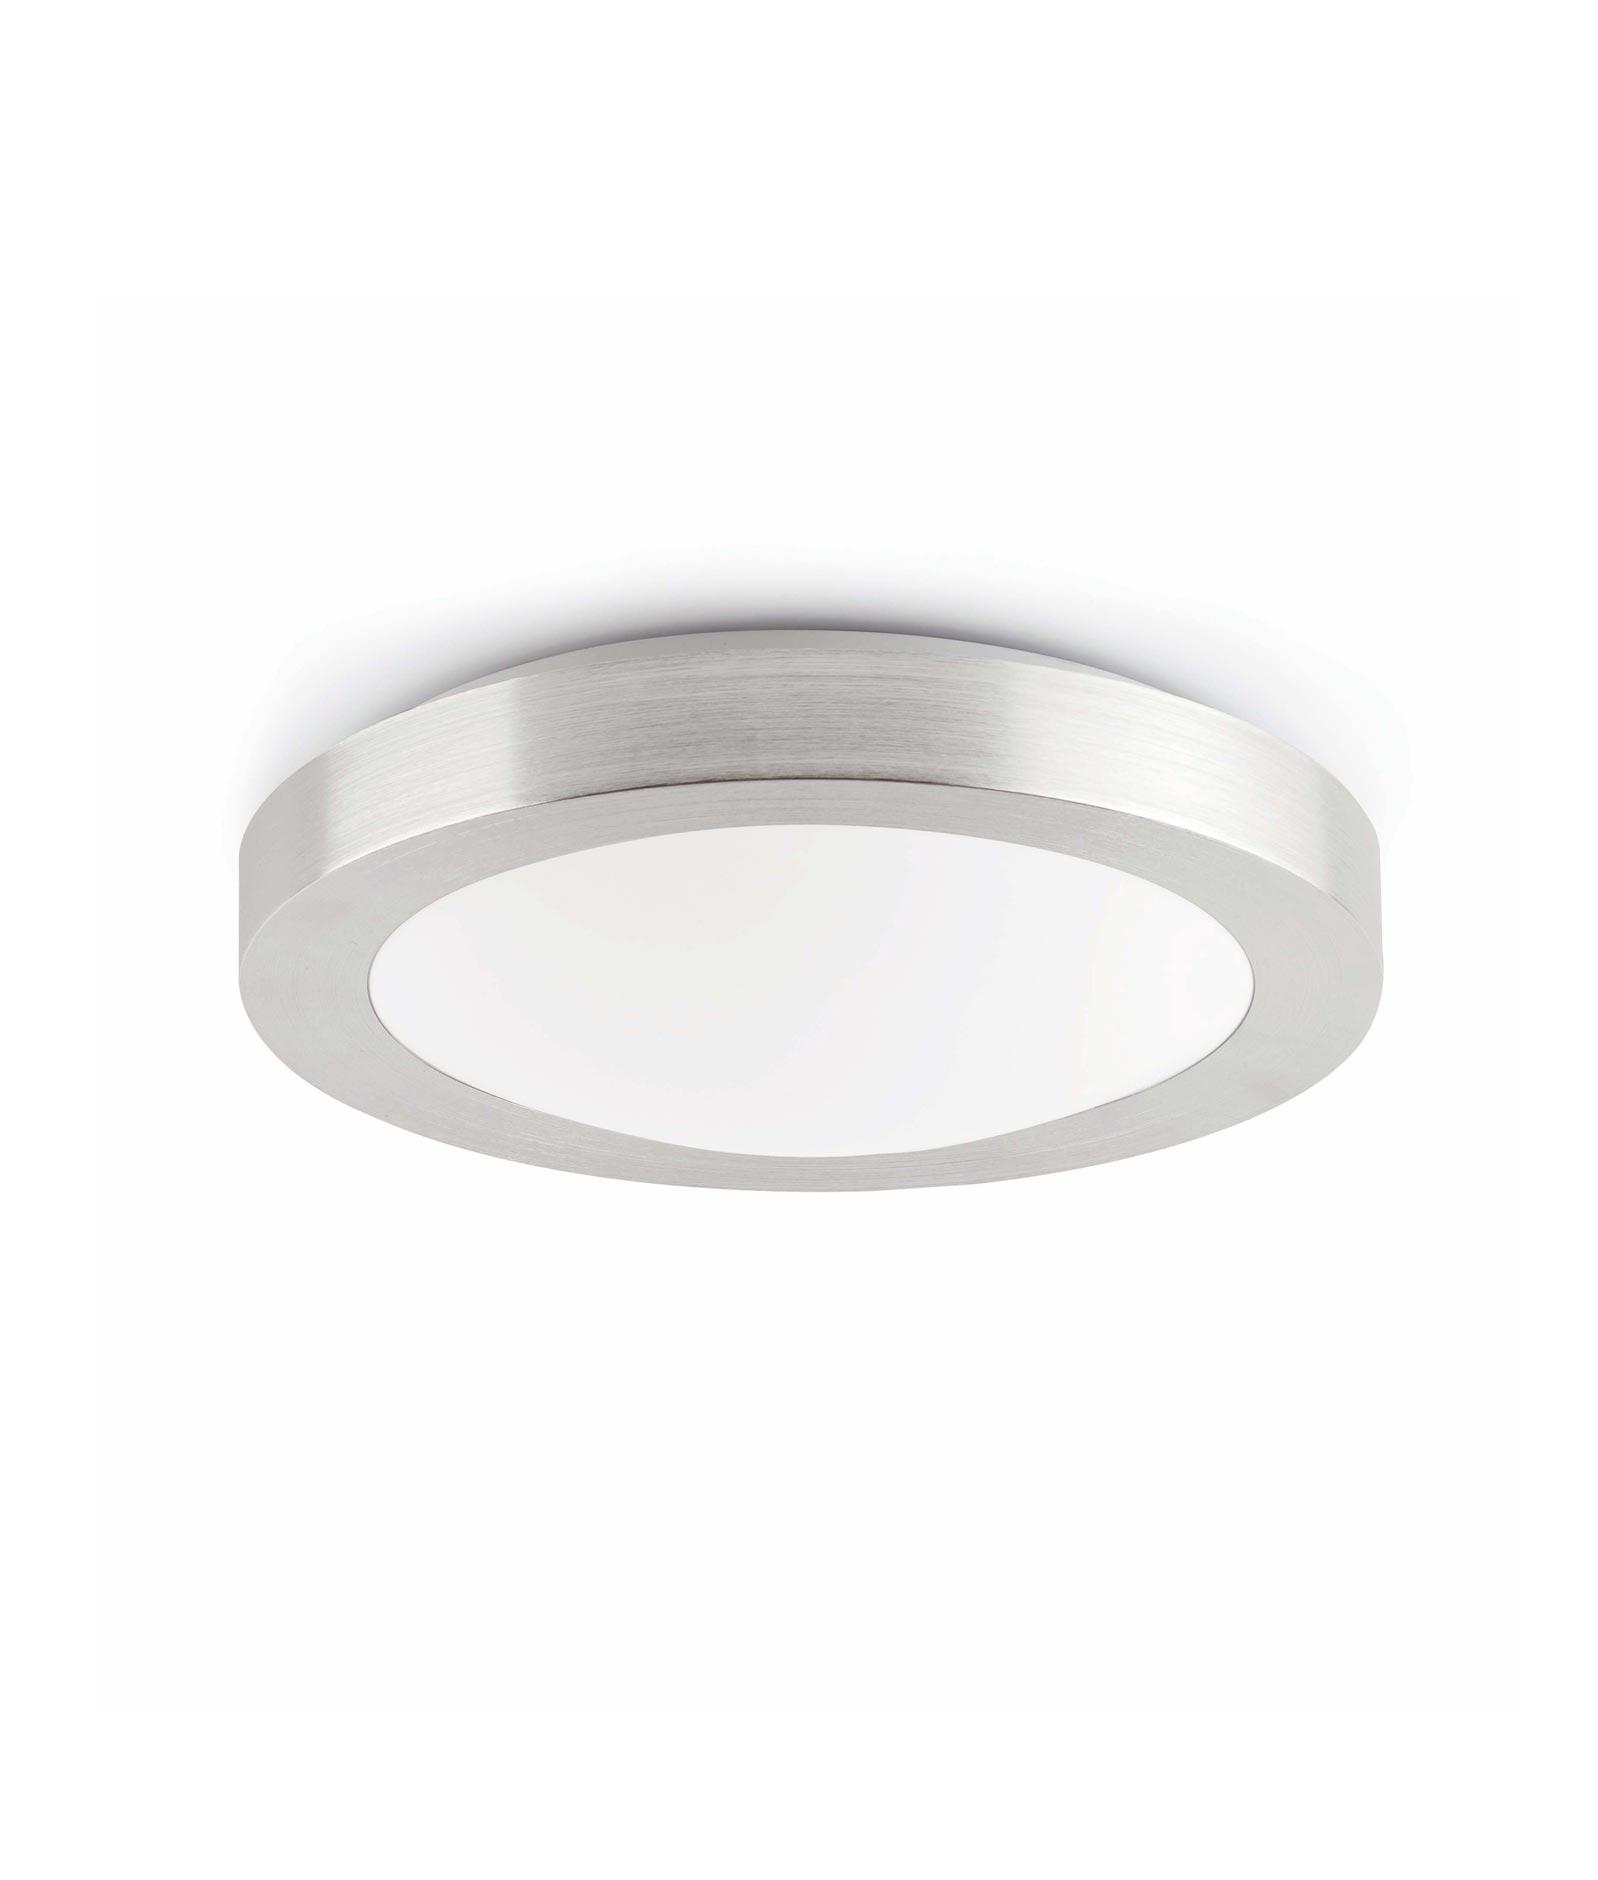 Plafón gris 2 luces LOGOS